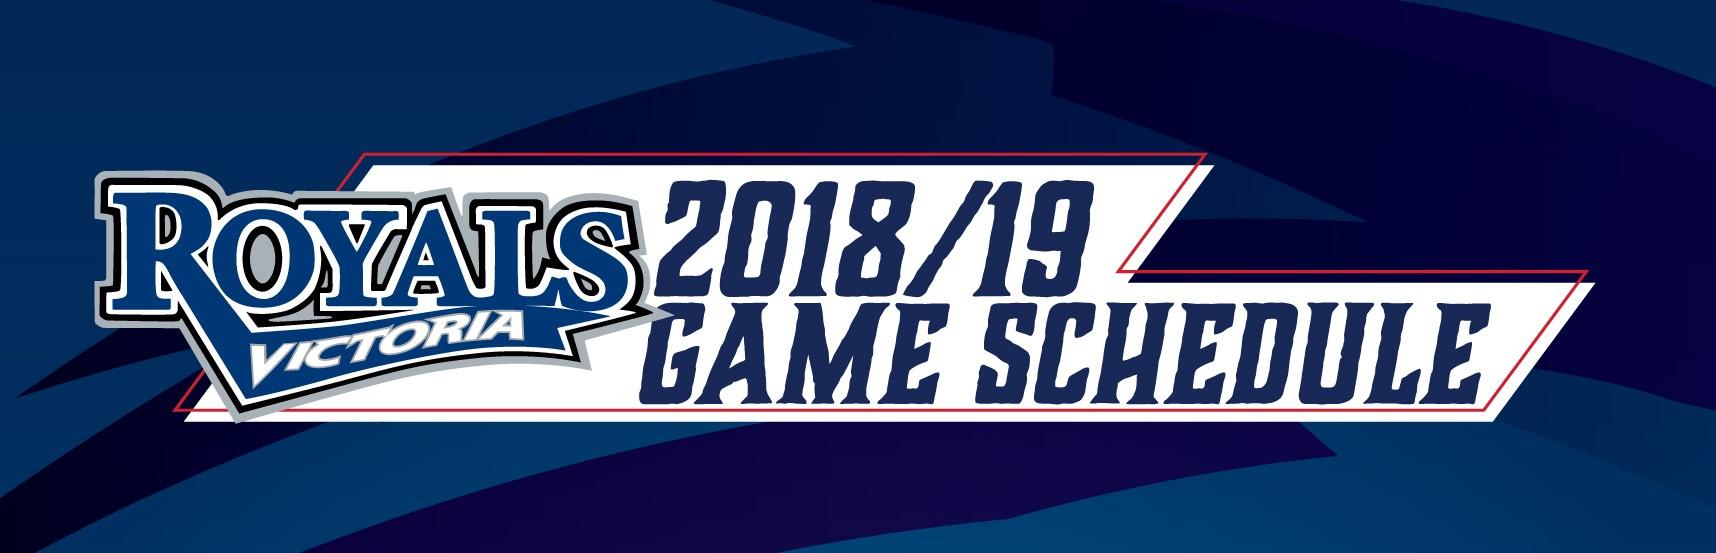 Royals Announce 2018-19 Schedule